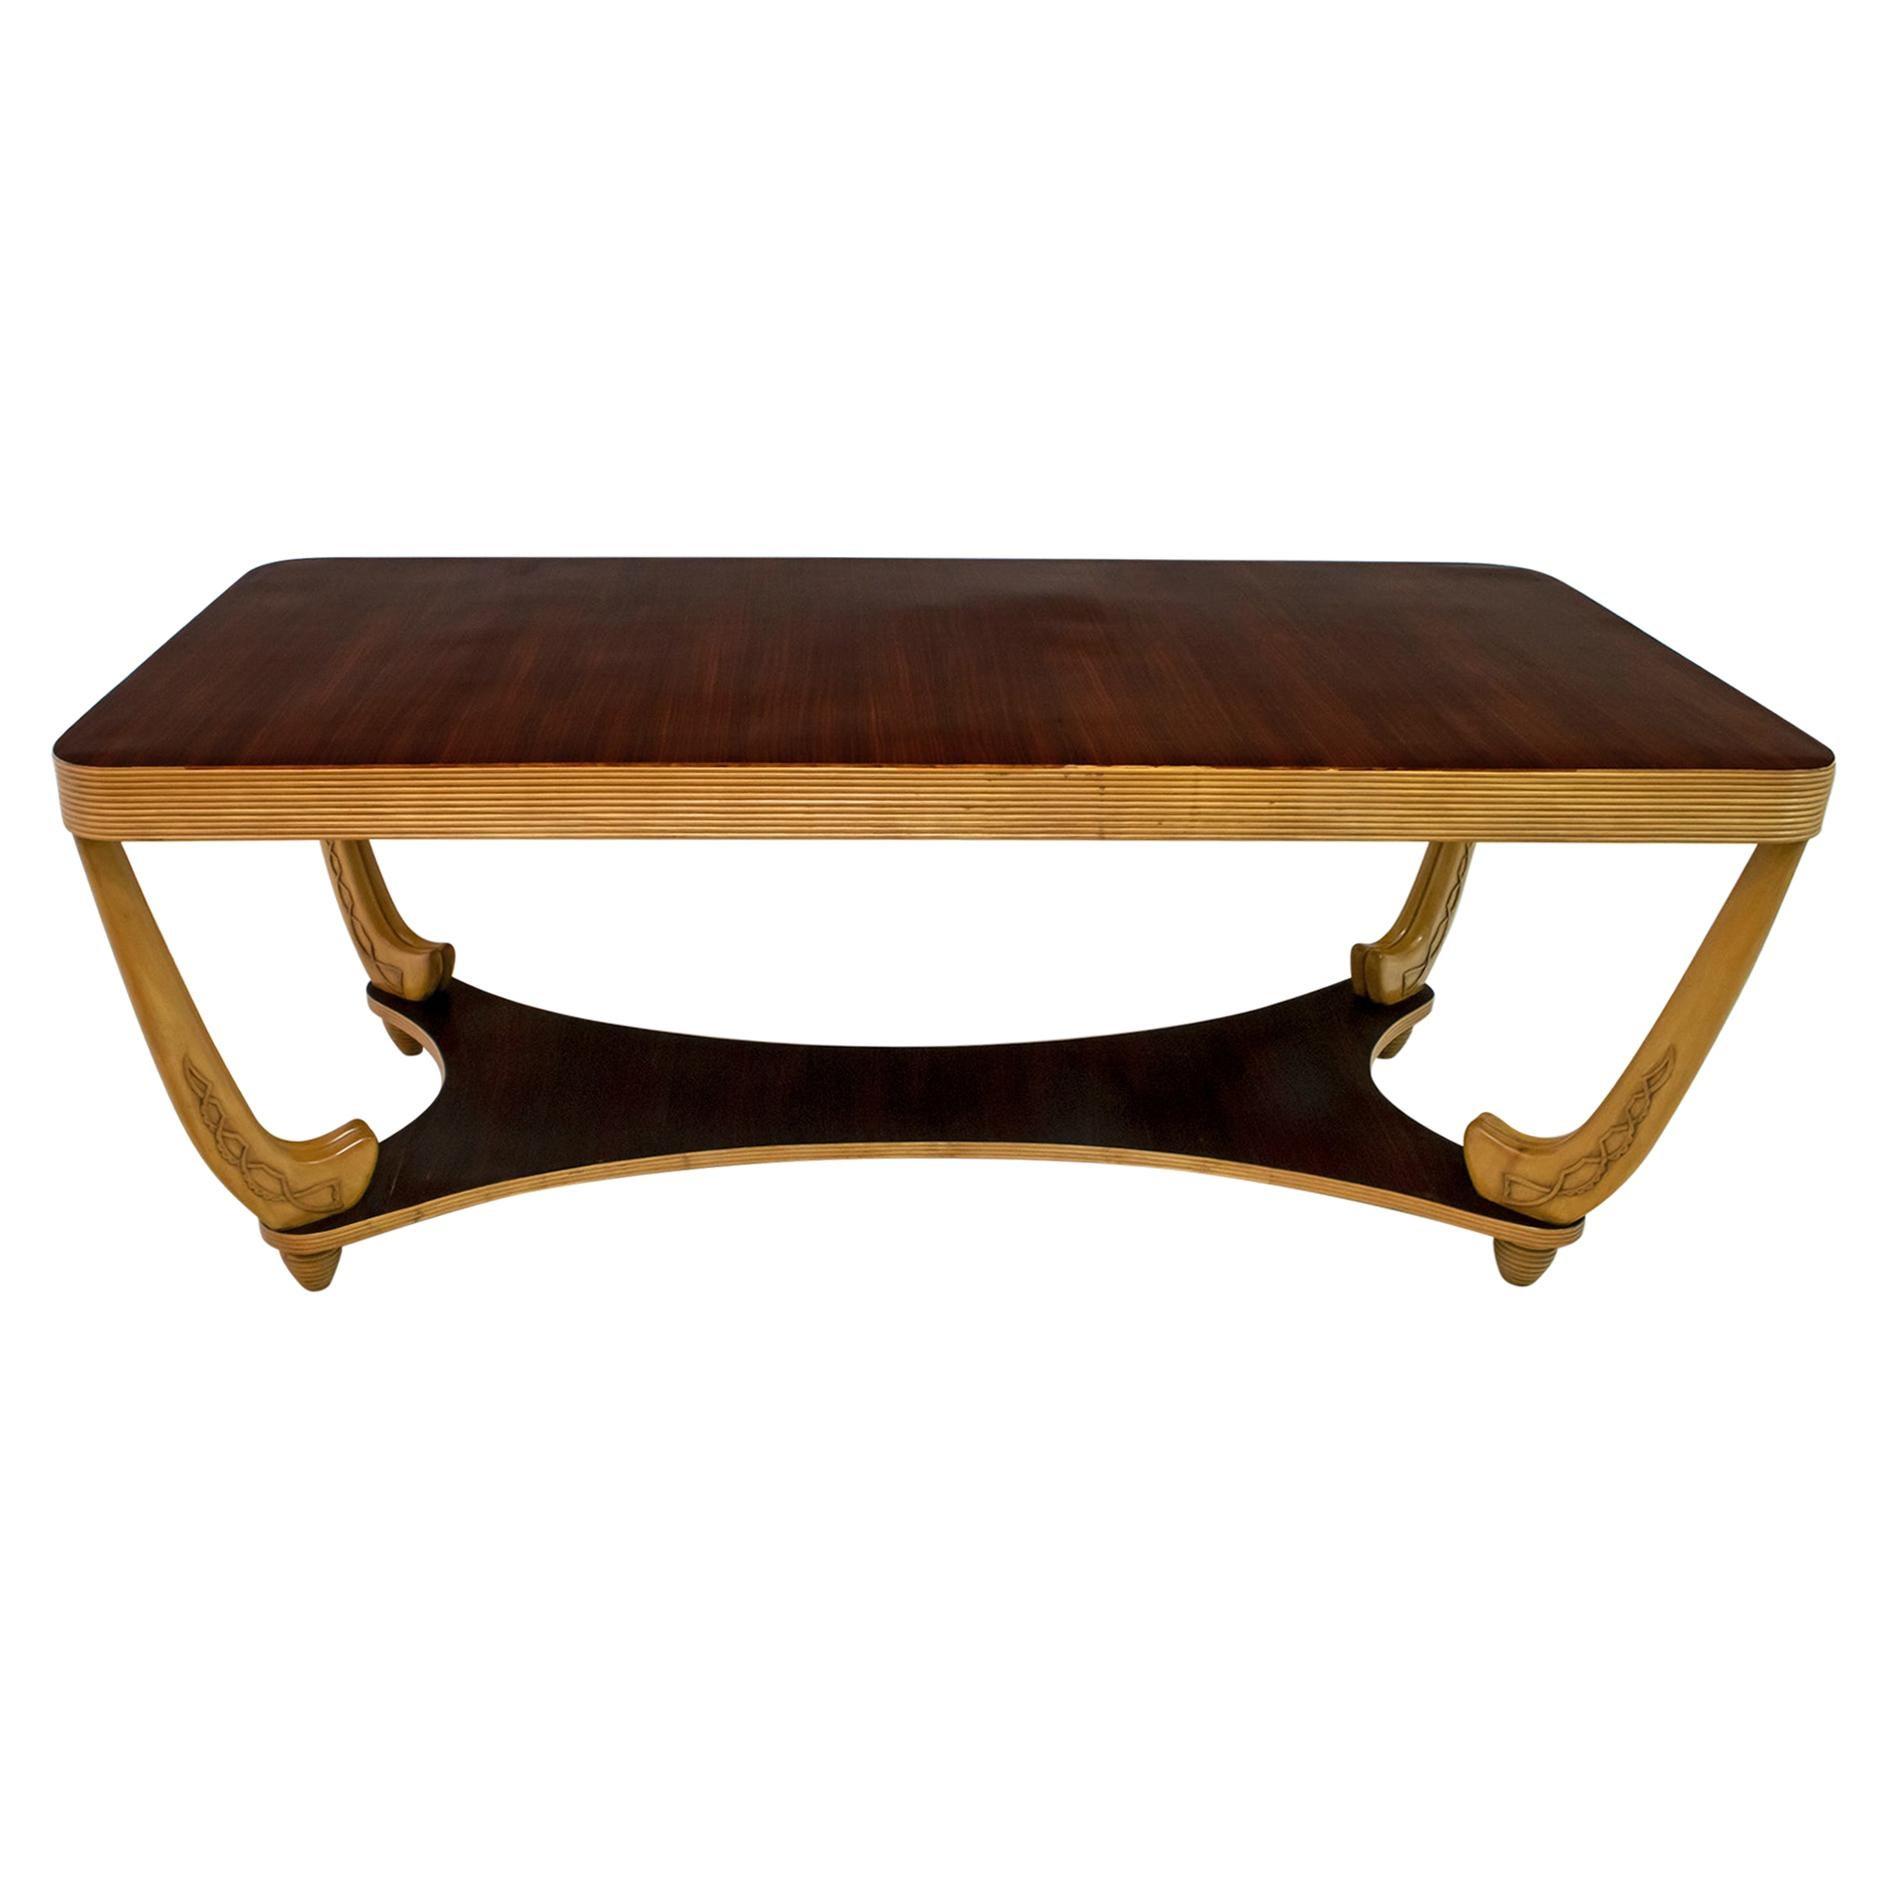 After Pier Luigi Colli Midcentury Italian Maple and Walnut Table, 1940s